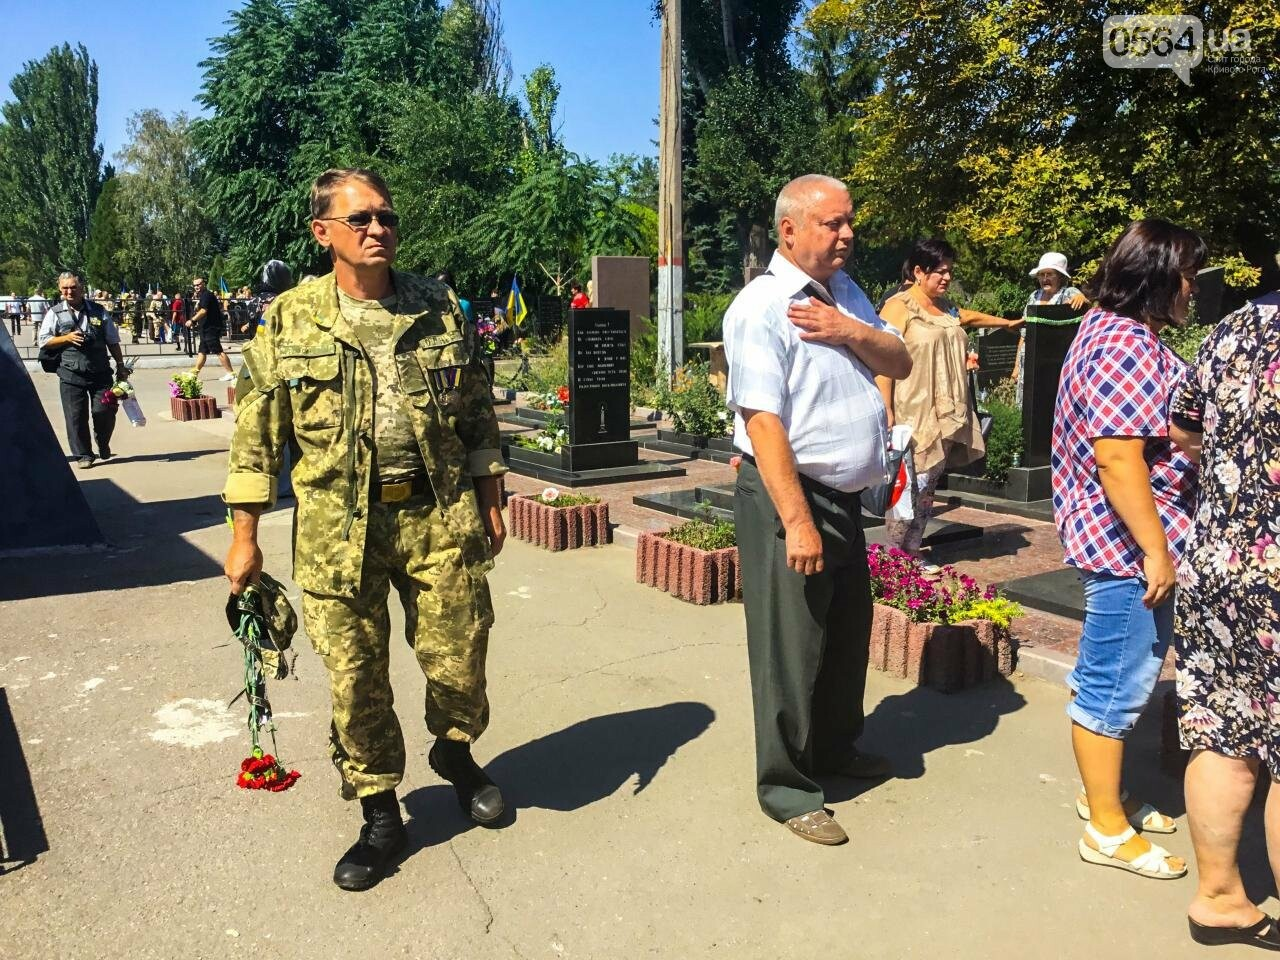 На Аллее Героев провели панихиду по погибшим в зоне АТО криворожанам, - ФОТО , фото-23